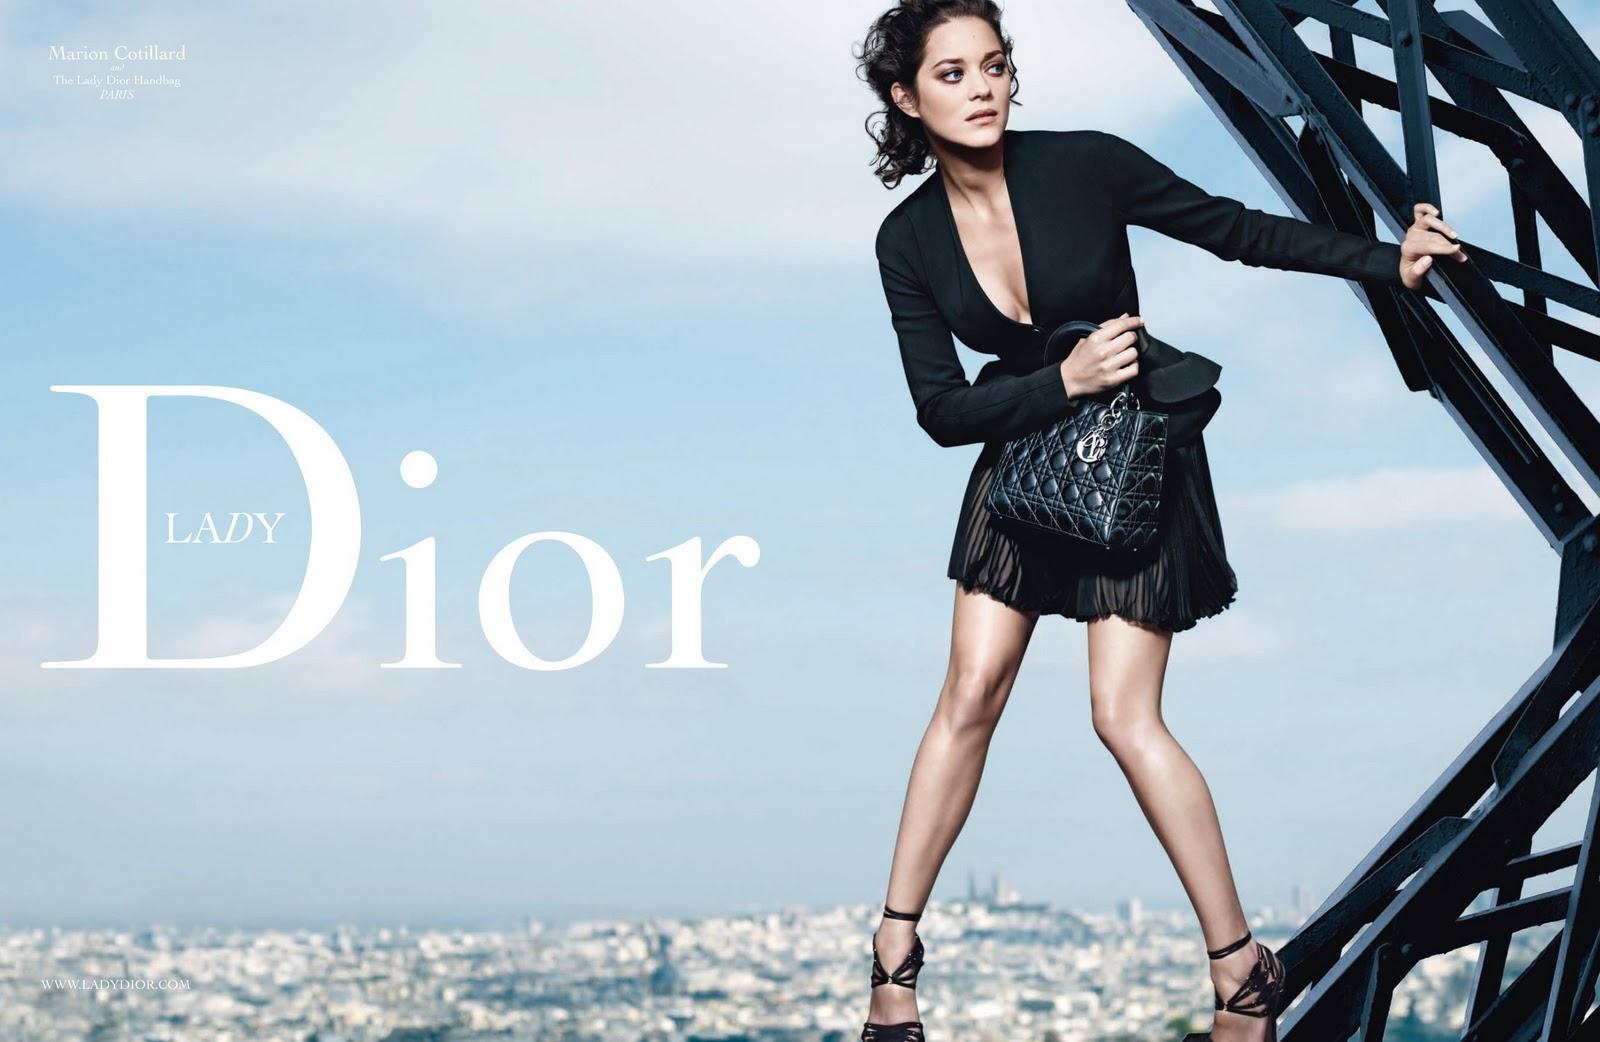 Lady Black Affair Paris